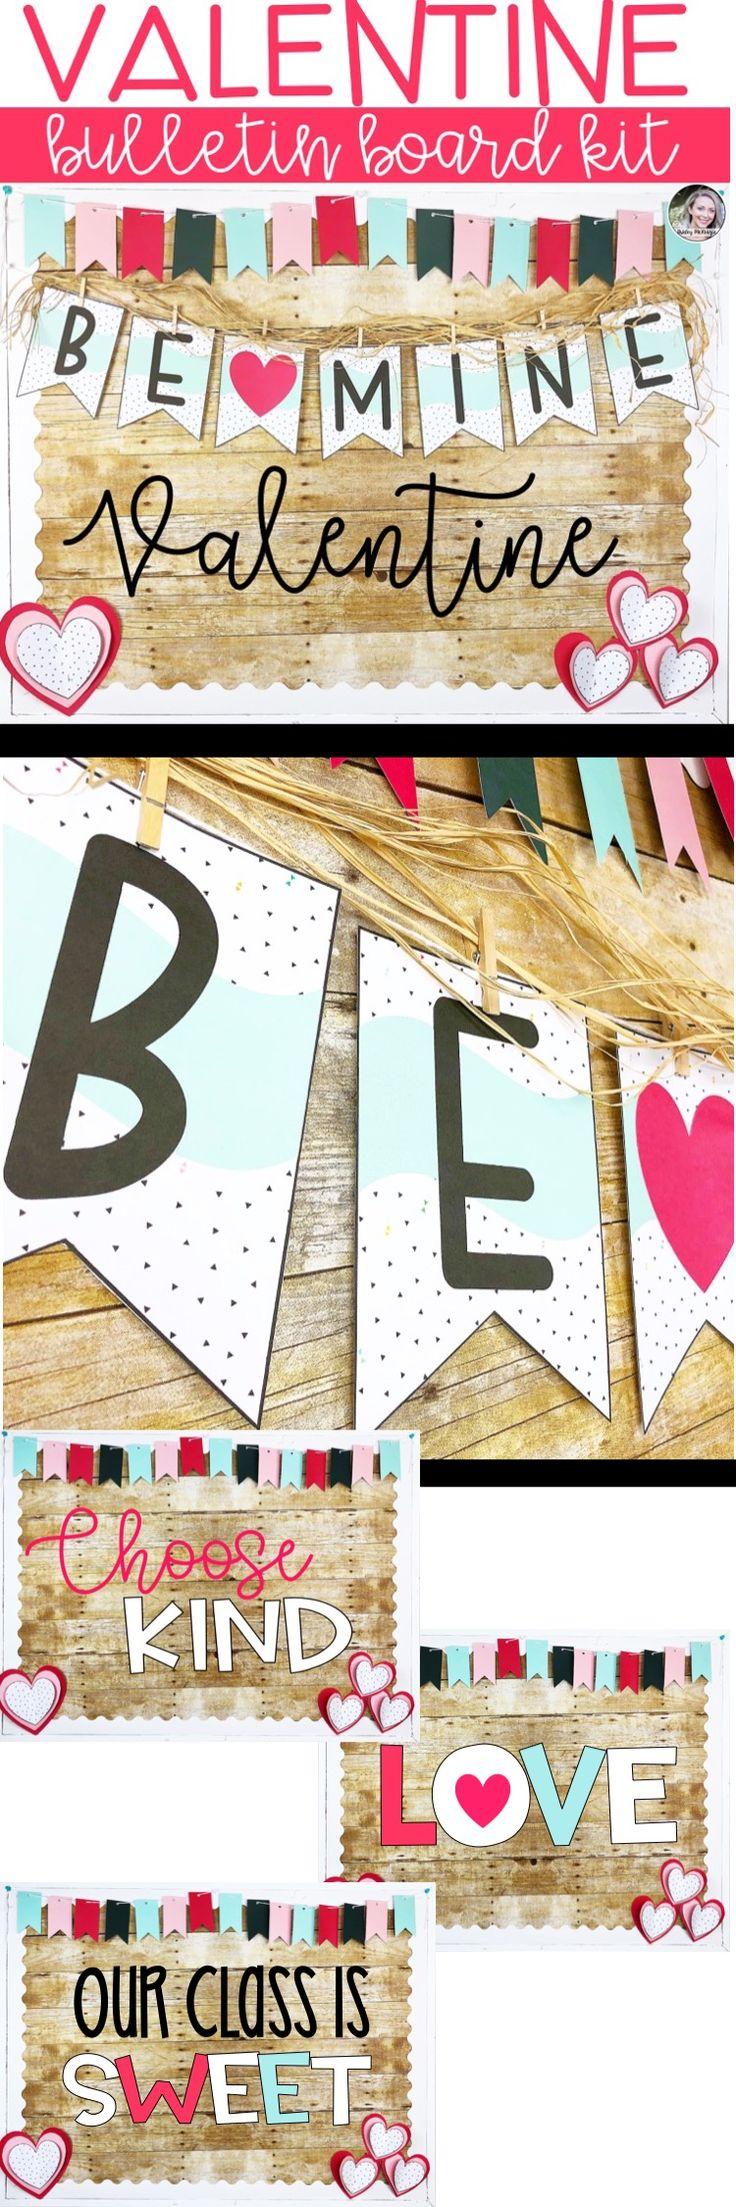 Valentine's Day Bulletin Board Ideas. February Bulletin Board. Bee Mine Valentine. Choose Kind. Our Class is Sweet!